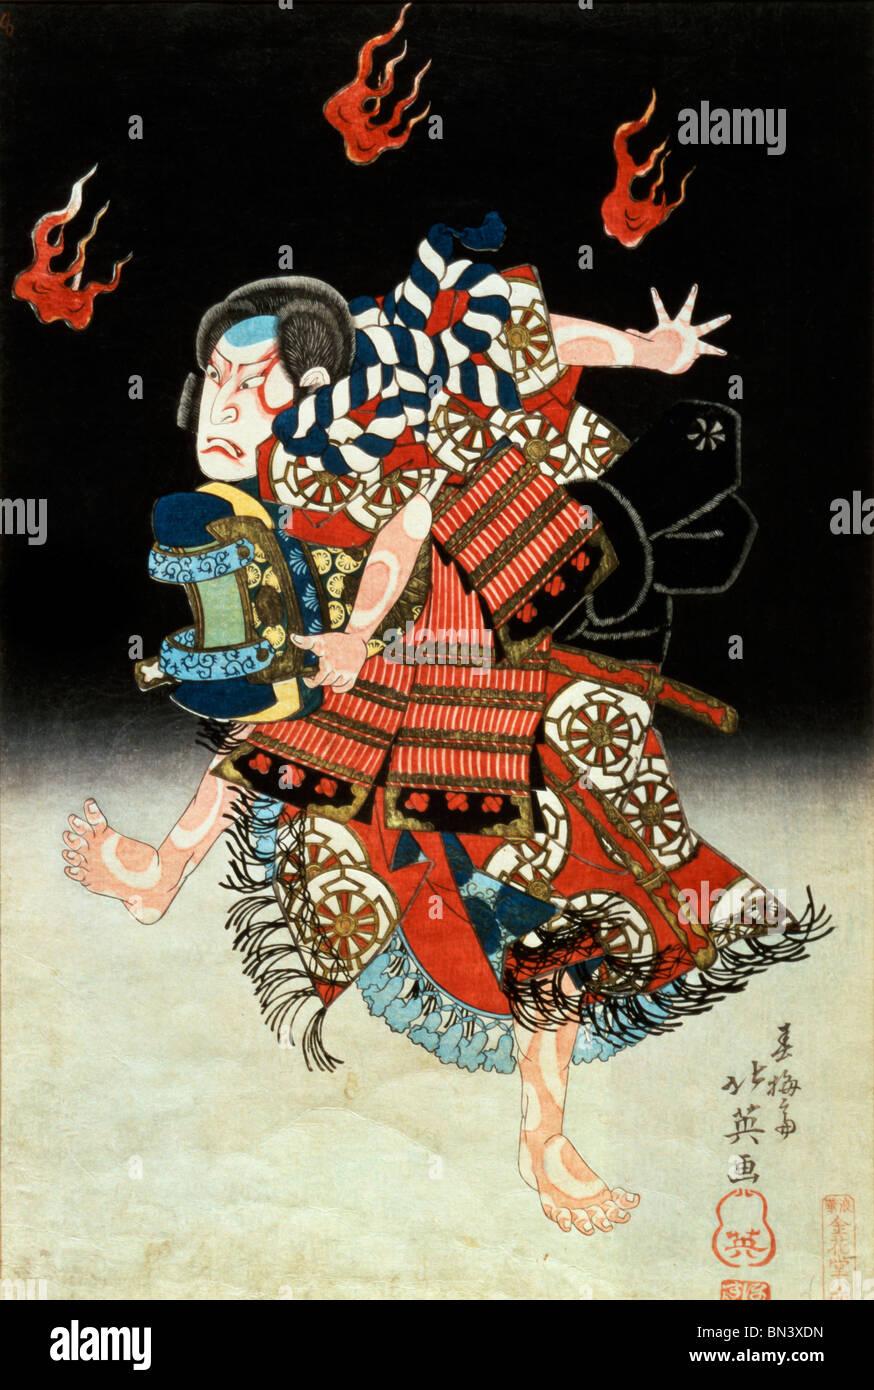 Nakamura Shikan II as Tadanobu, by Shunbaisai Hokuei. Japan, 1835 - Stock Image